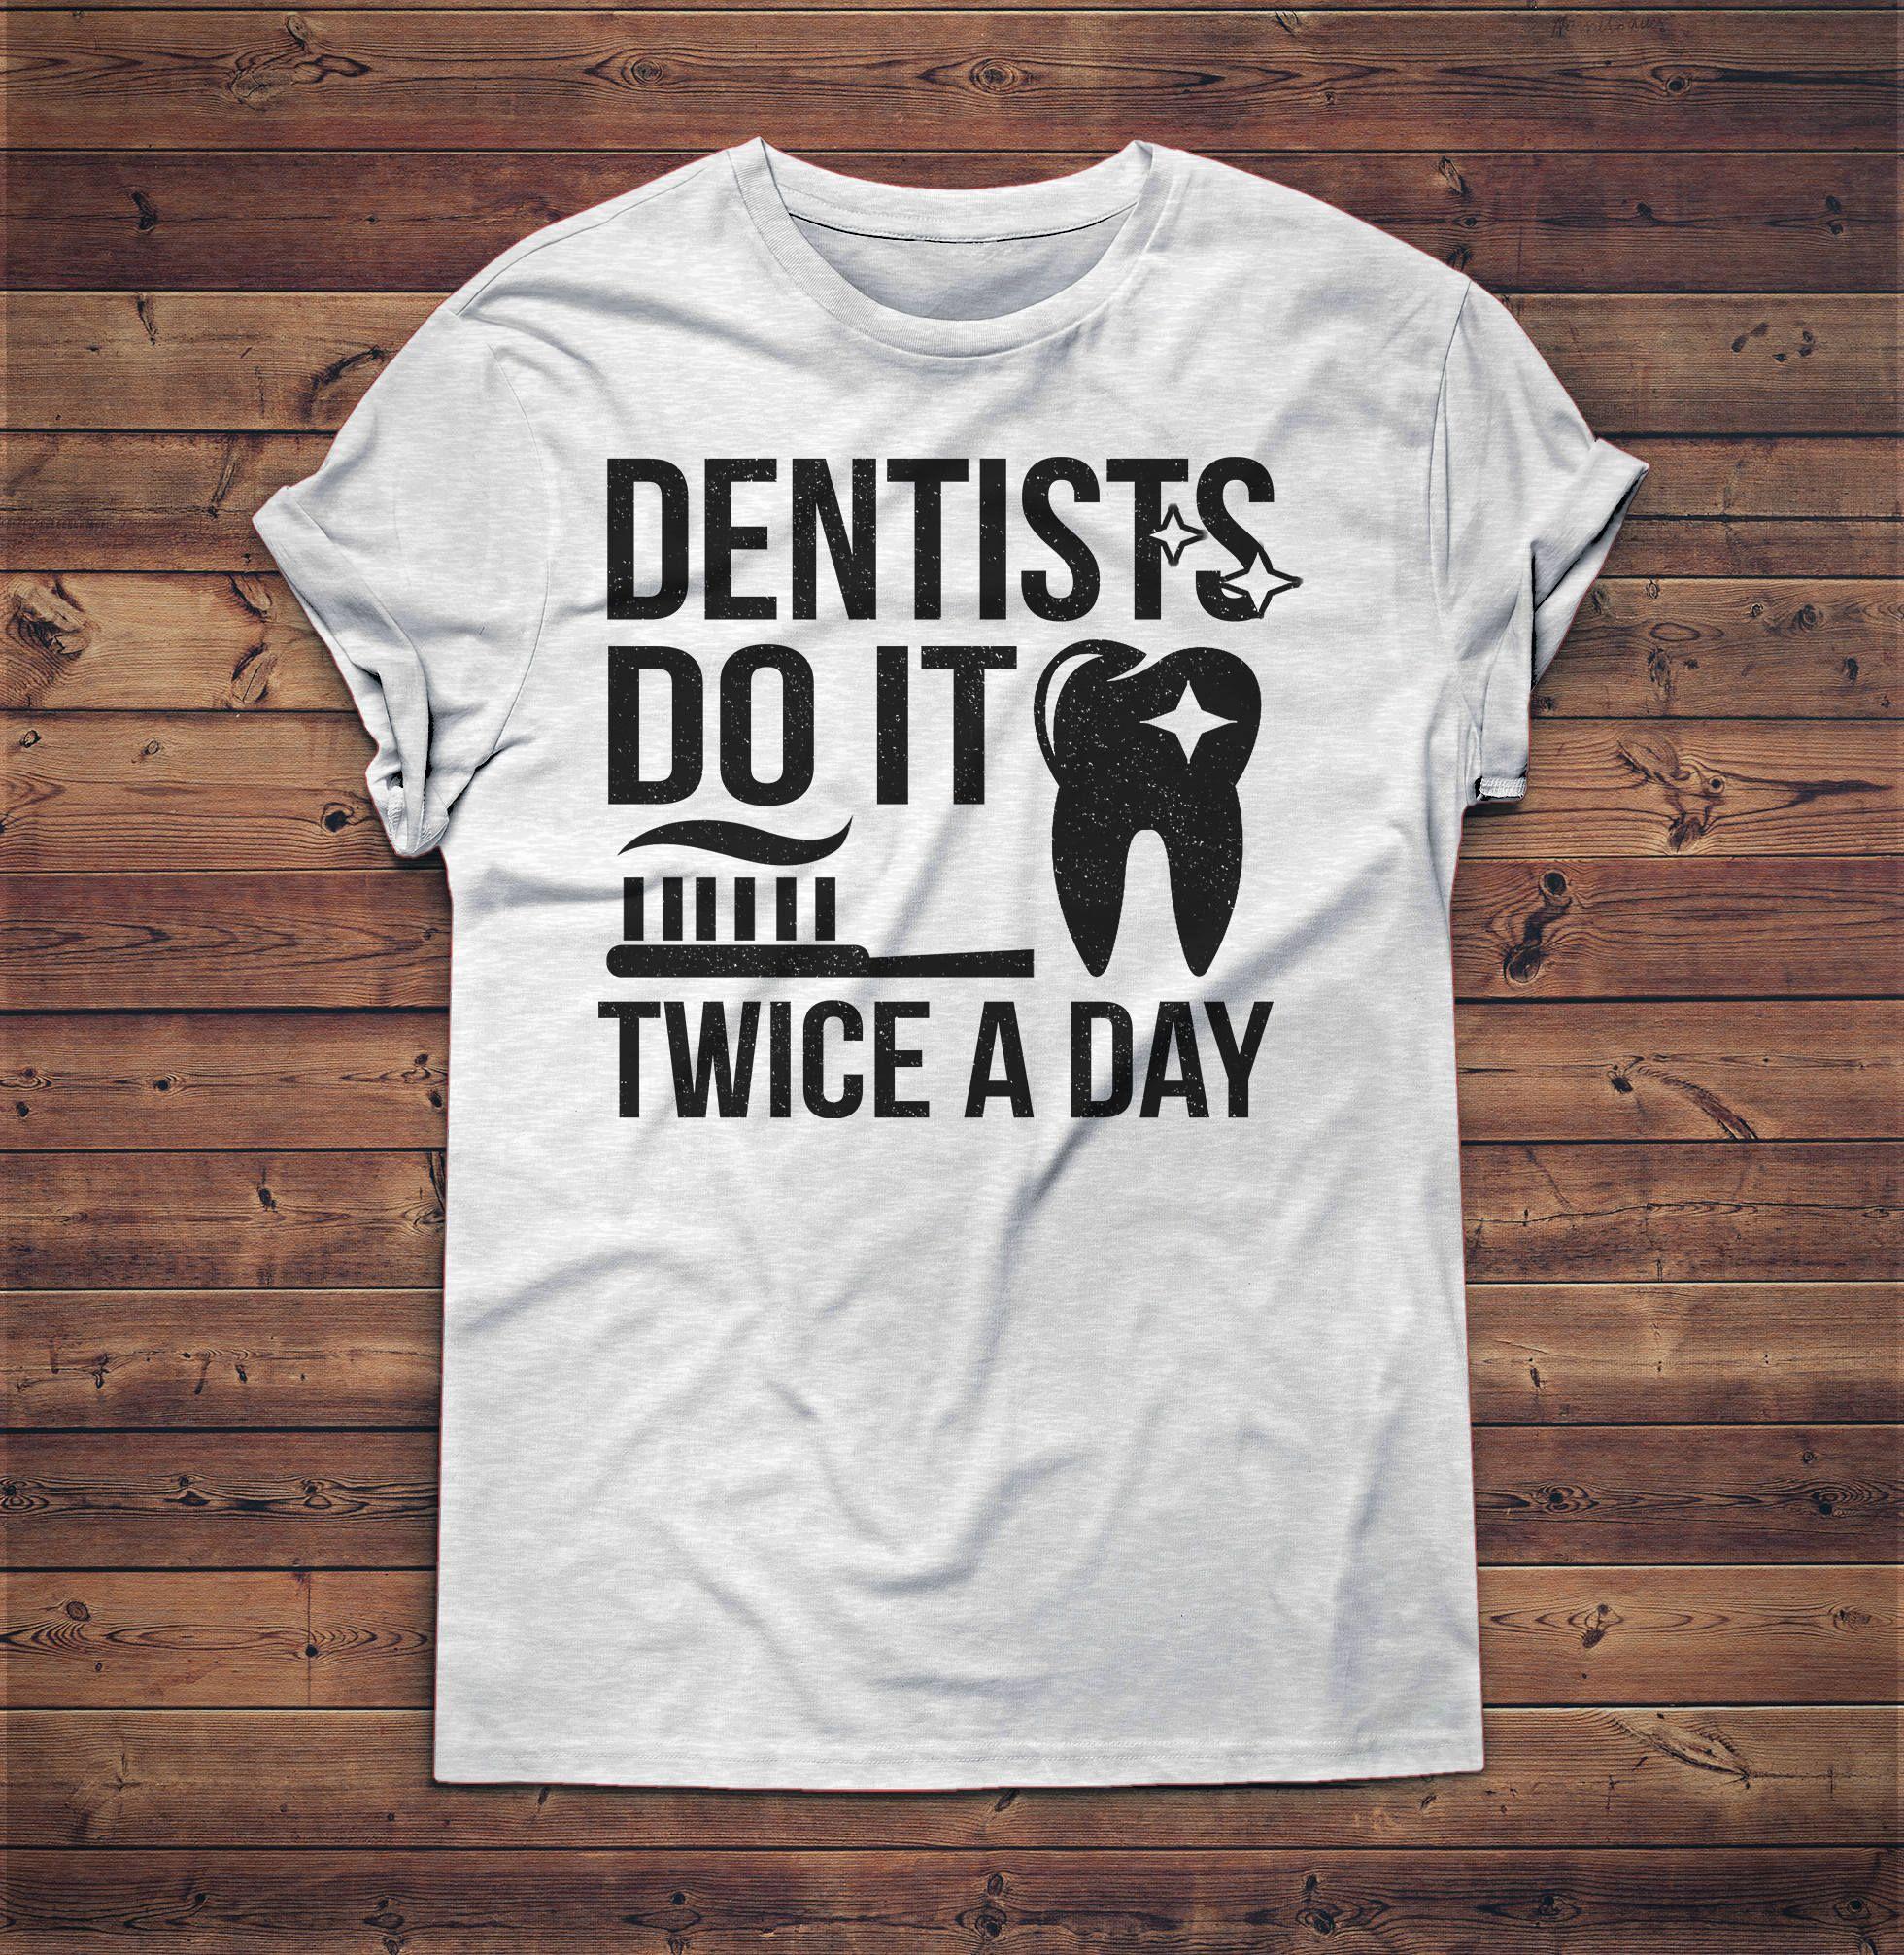 Dentist Shirt Dental Student Gift for Dentist Dentist Gift Future Dentist Dentist Graduation Dental Hygienist Dental Assistant